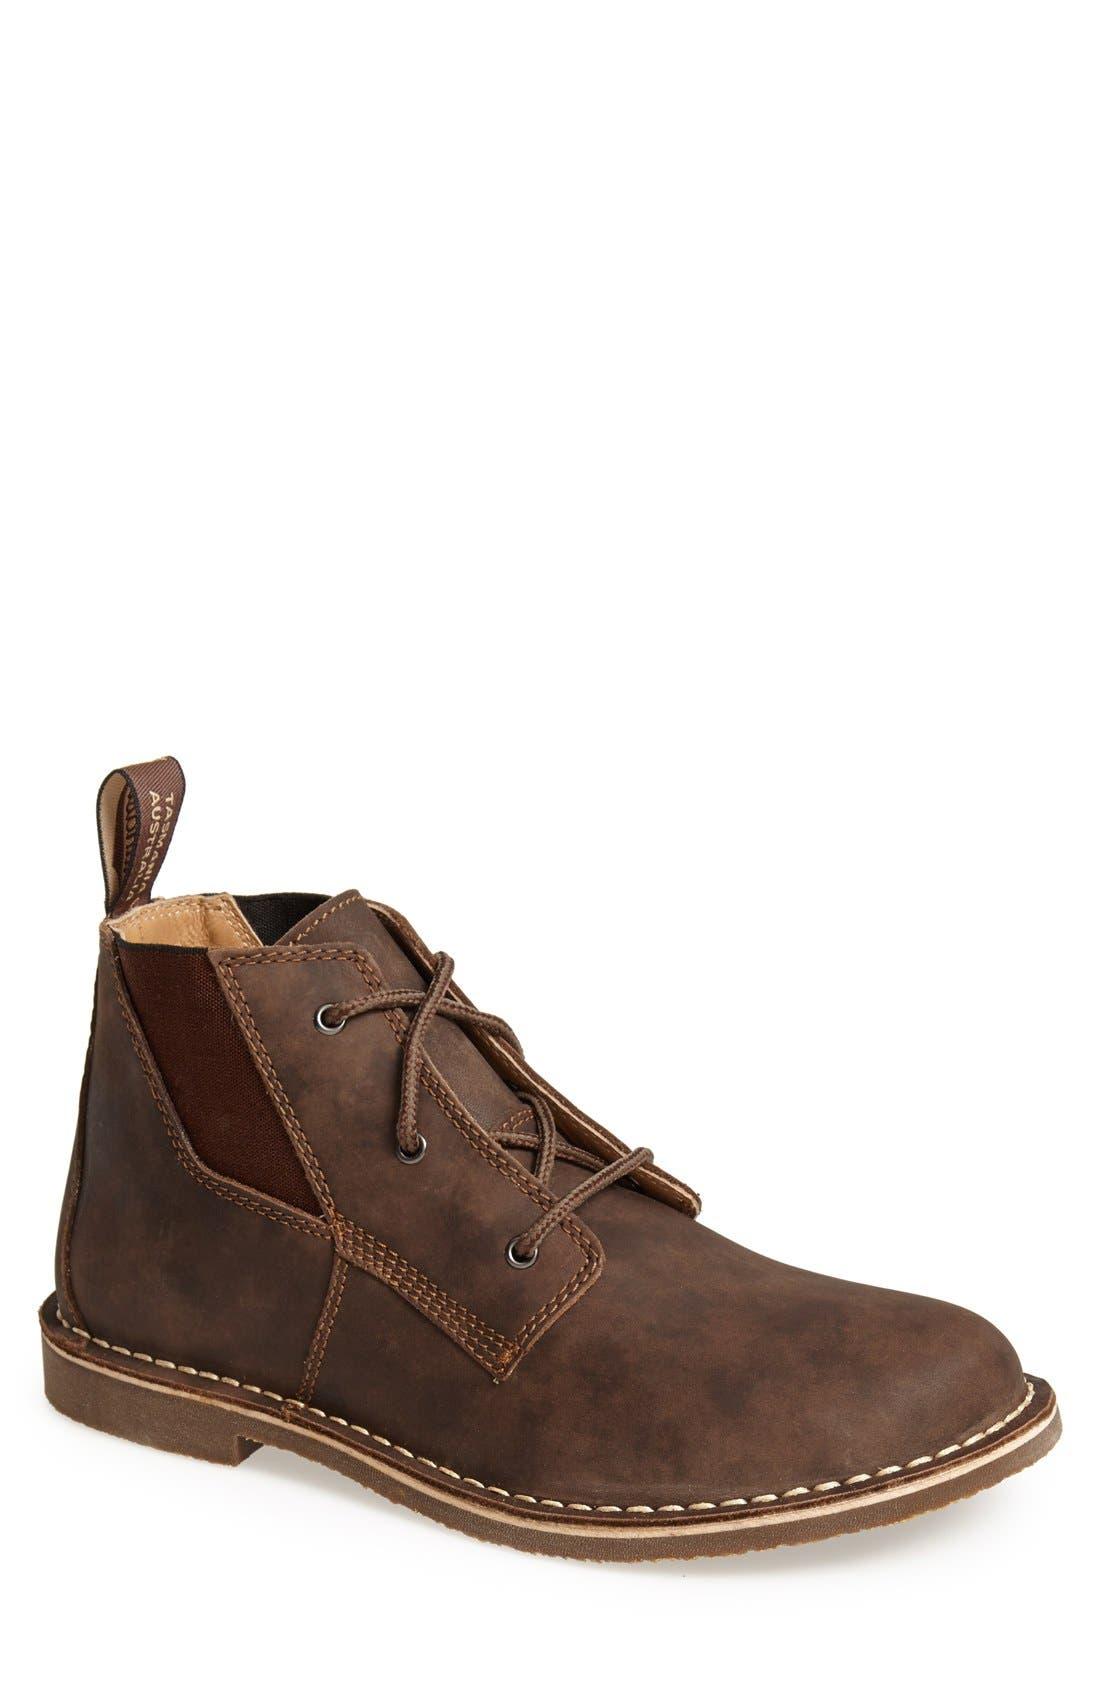 Blundstone Footwear Chukka Boot (Men) | Nordstrom